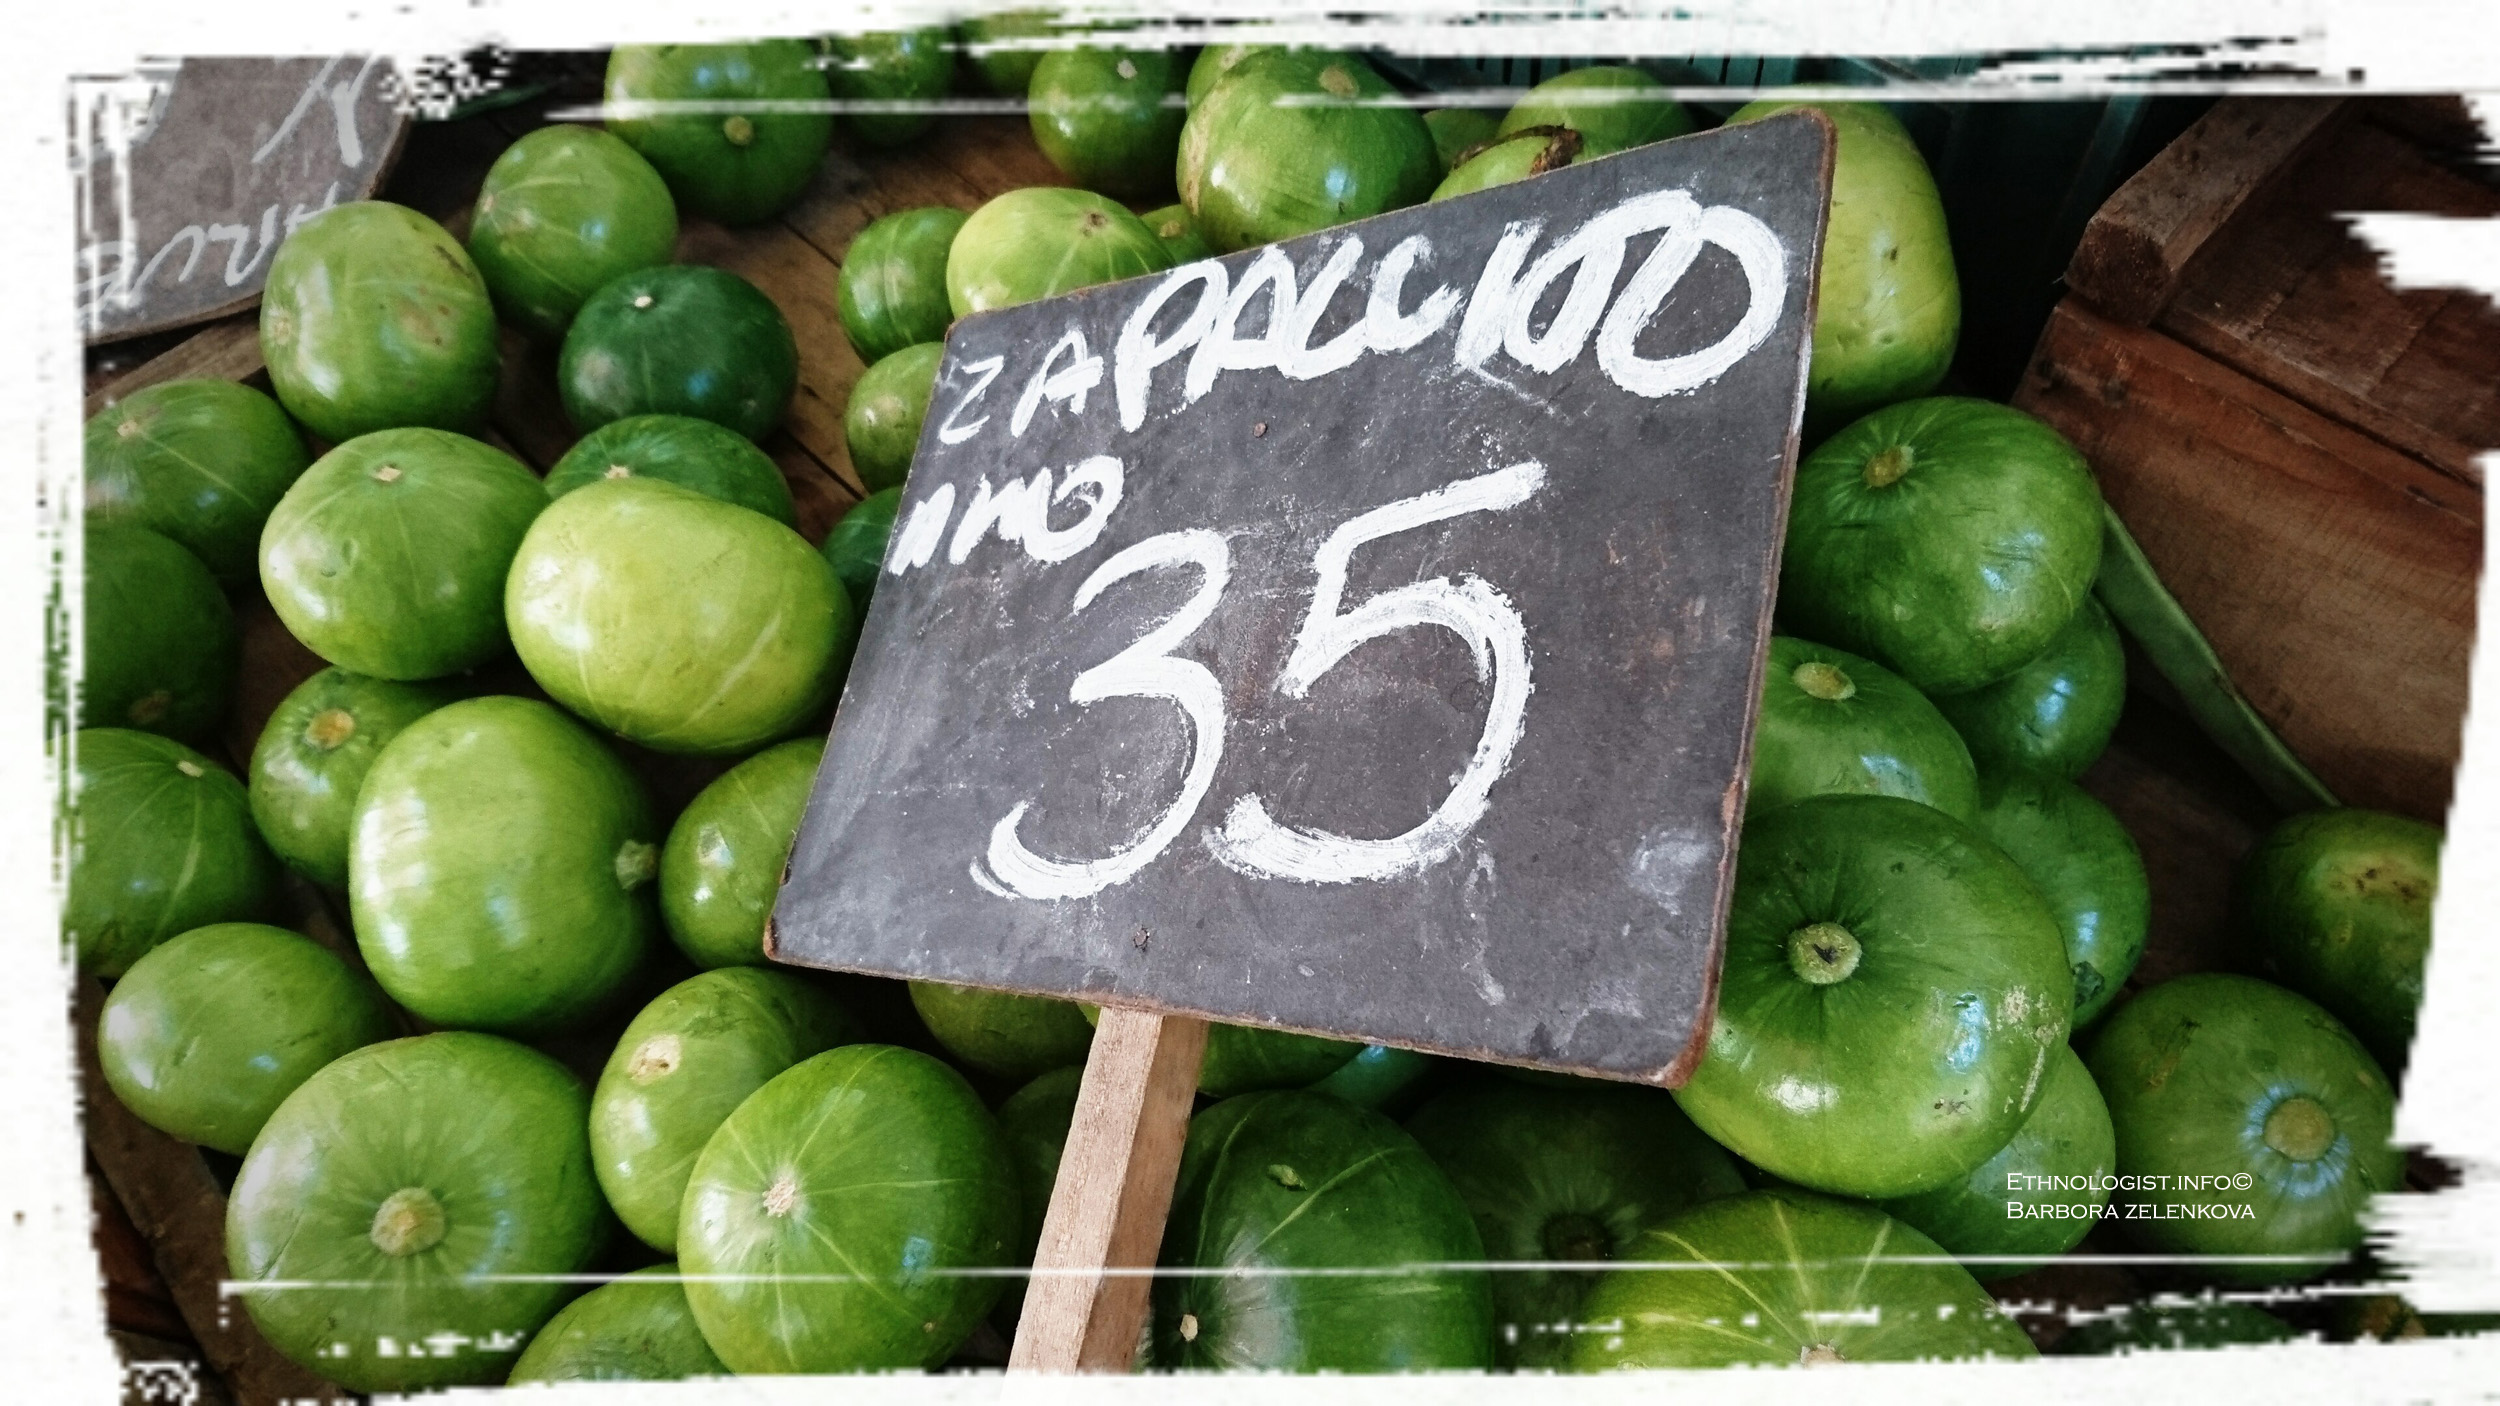 Popular vegetable Zapallitos in market in Montevideo. Photo: Barbora Zelenková, December, 2016.